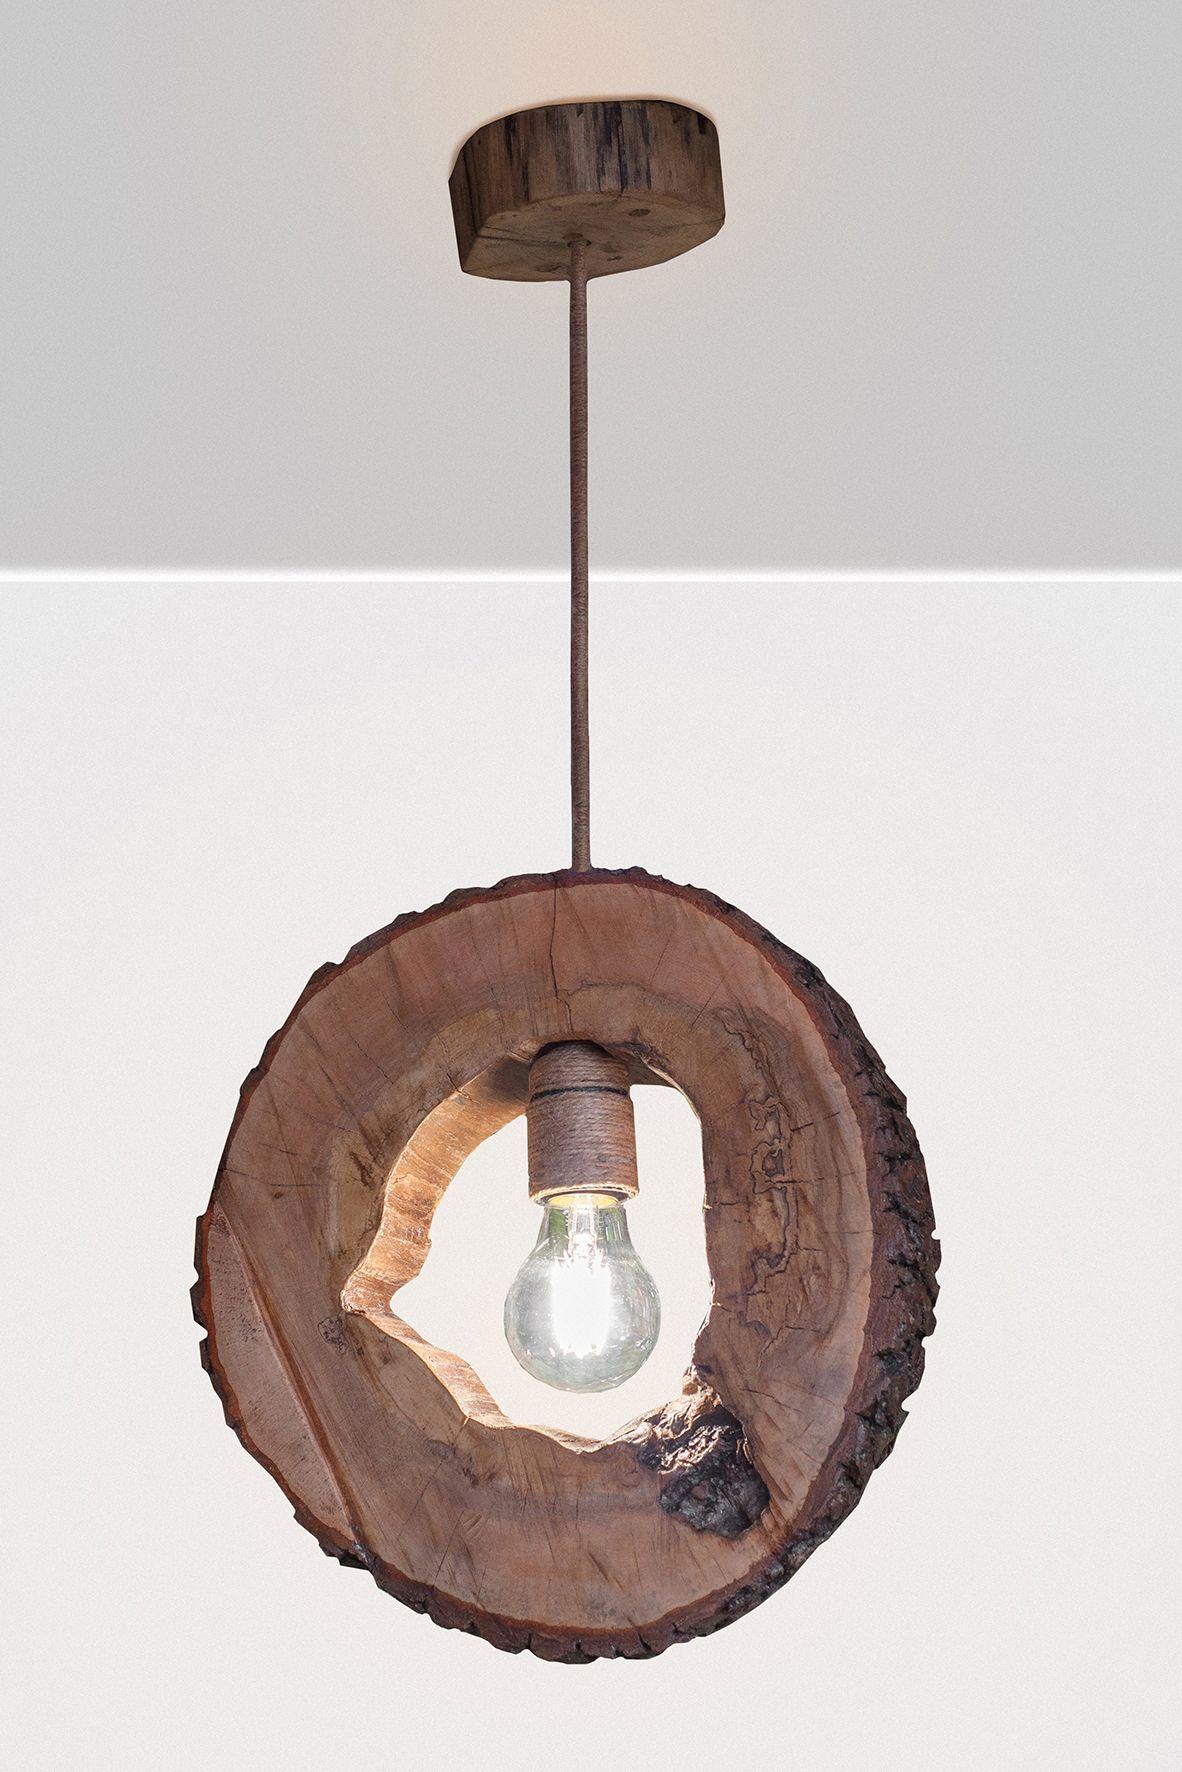 Driftwood Hanging Light Wood Pendant Lamp Wooden Lighting Wooden Chandelier Pendant Light Wood Lamp Ceiling Light Rustic Lighting Wooden Lamp Handmade Lamps Driftwood Lamp